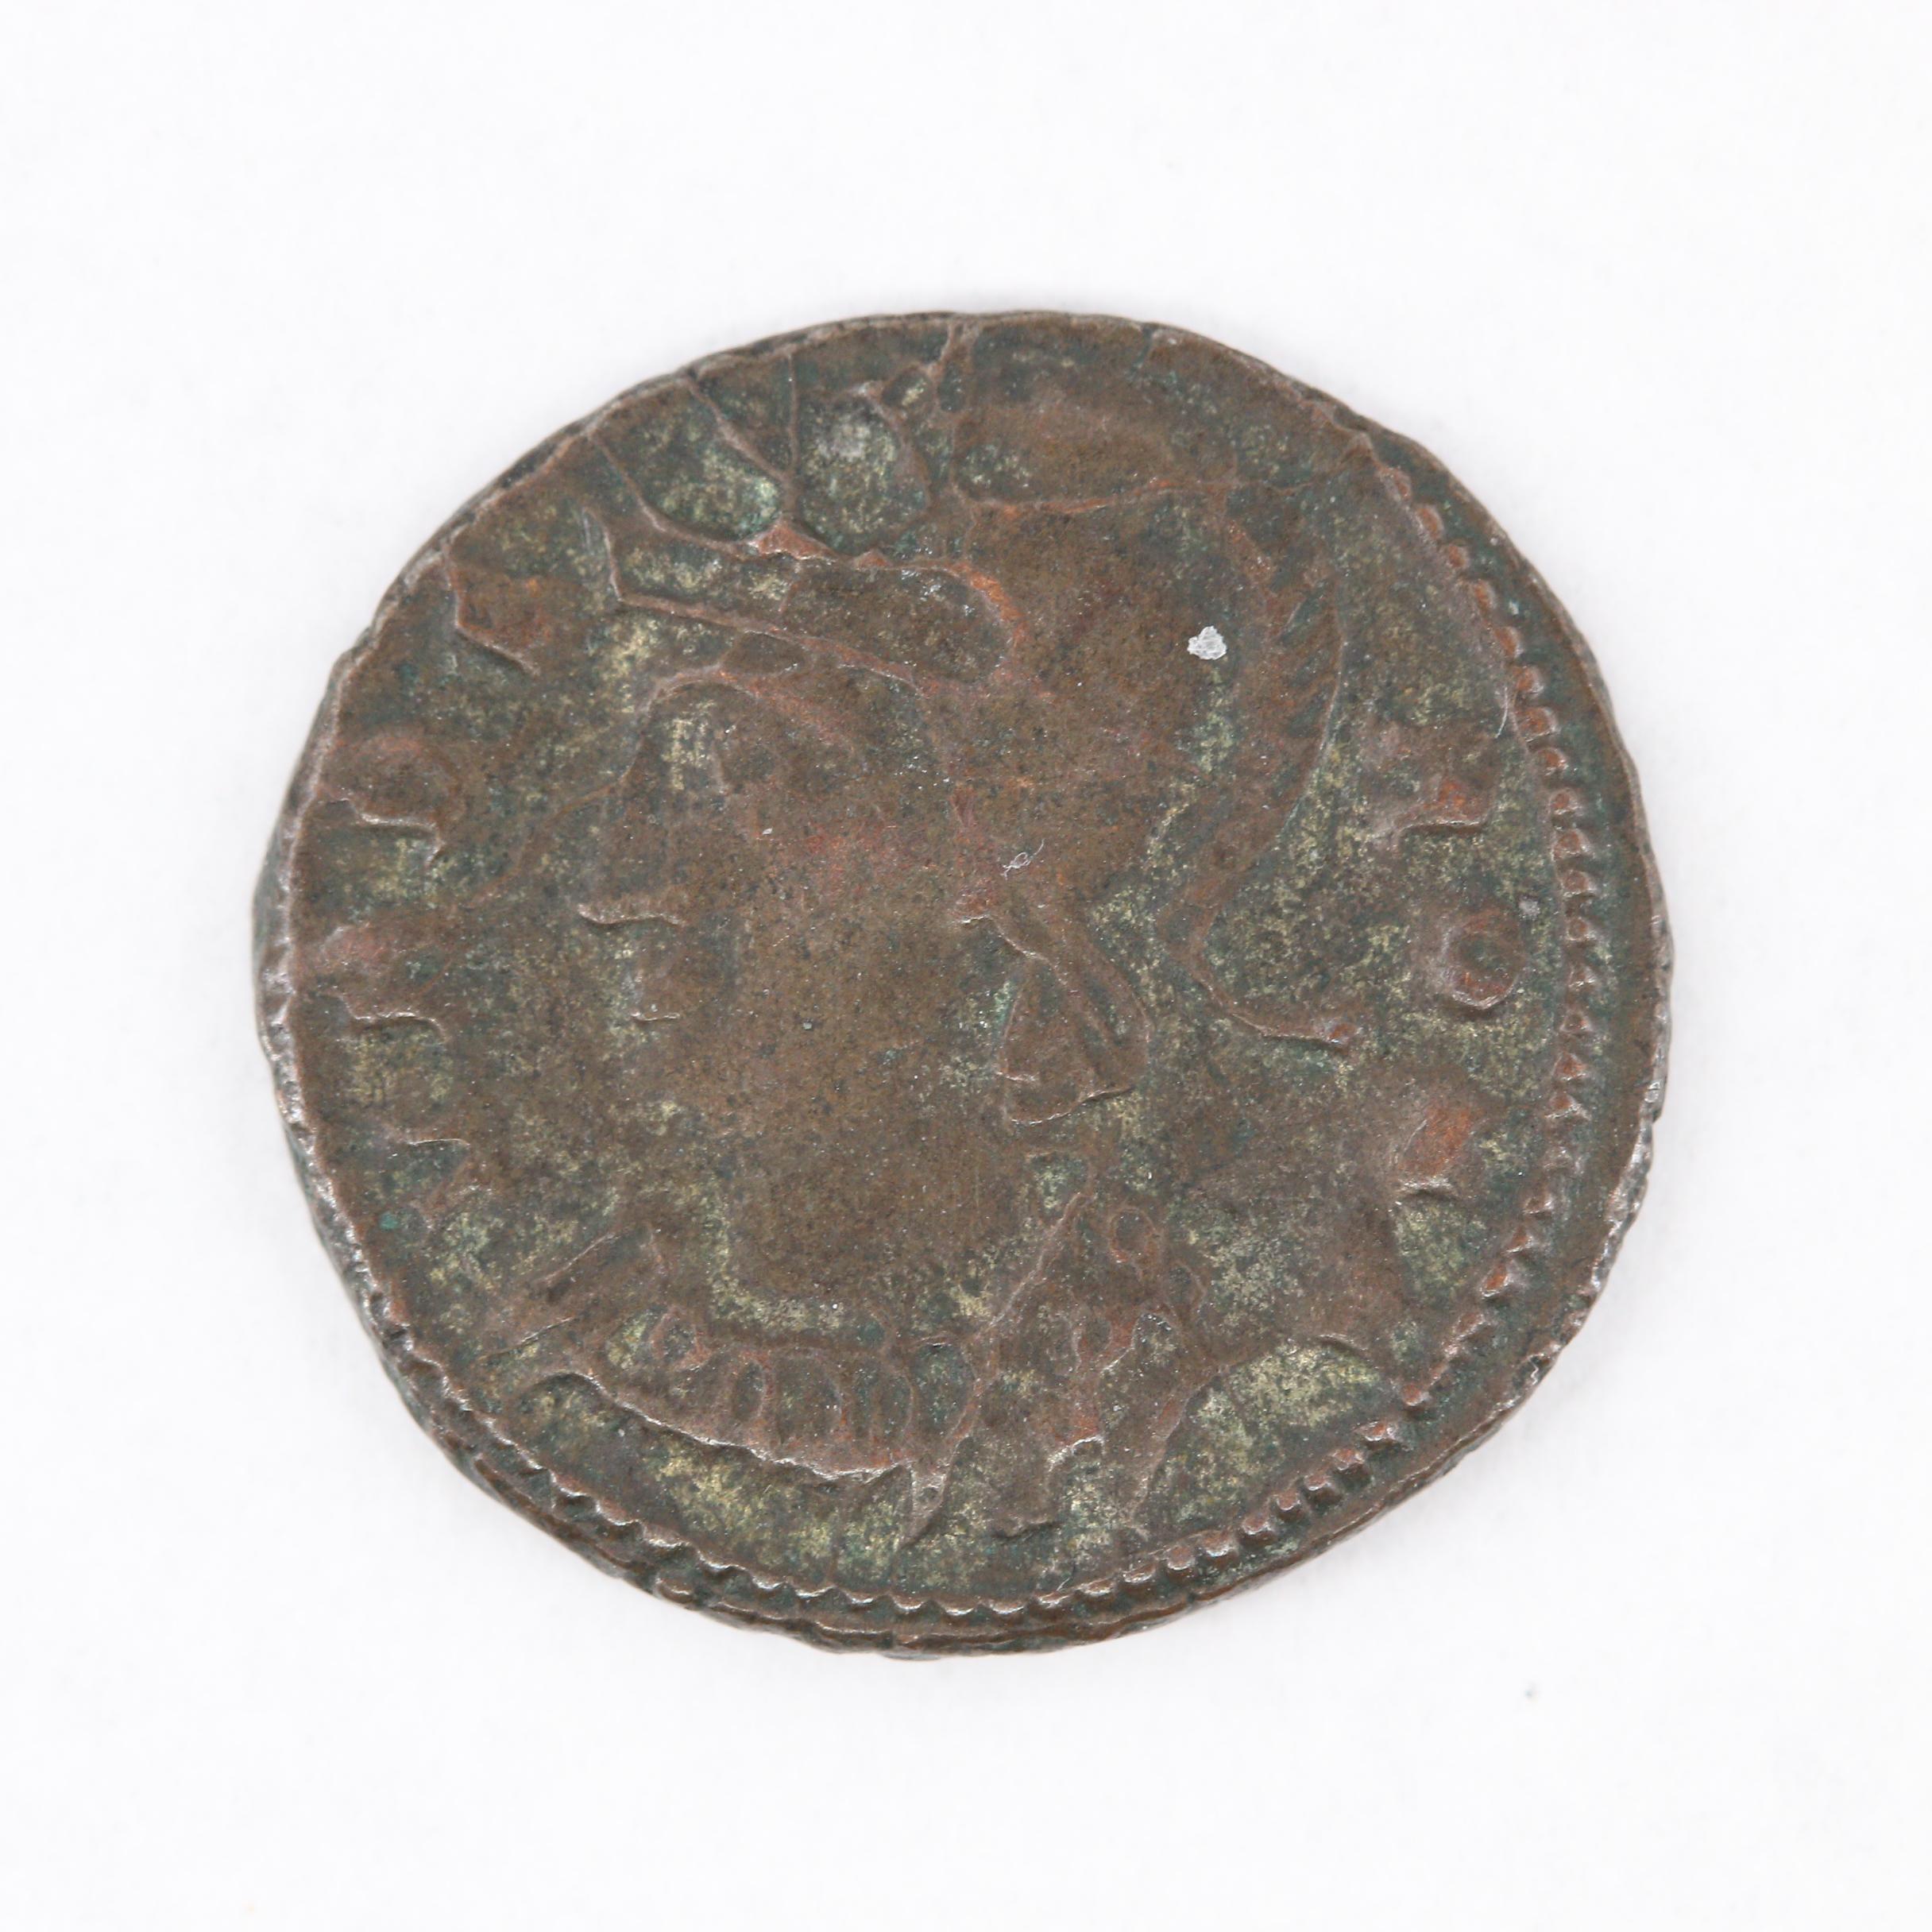 """Urbs Roma"" Commemorative Follis Coin, Constantine ""The Great"", ca. 330 A.D."